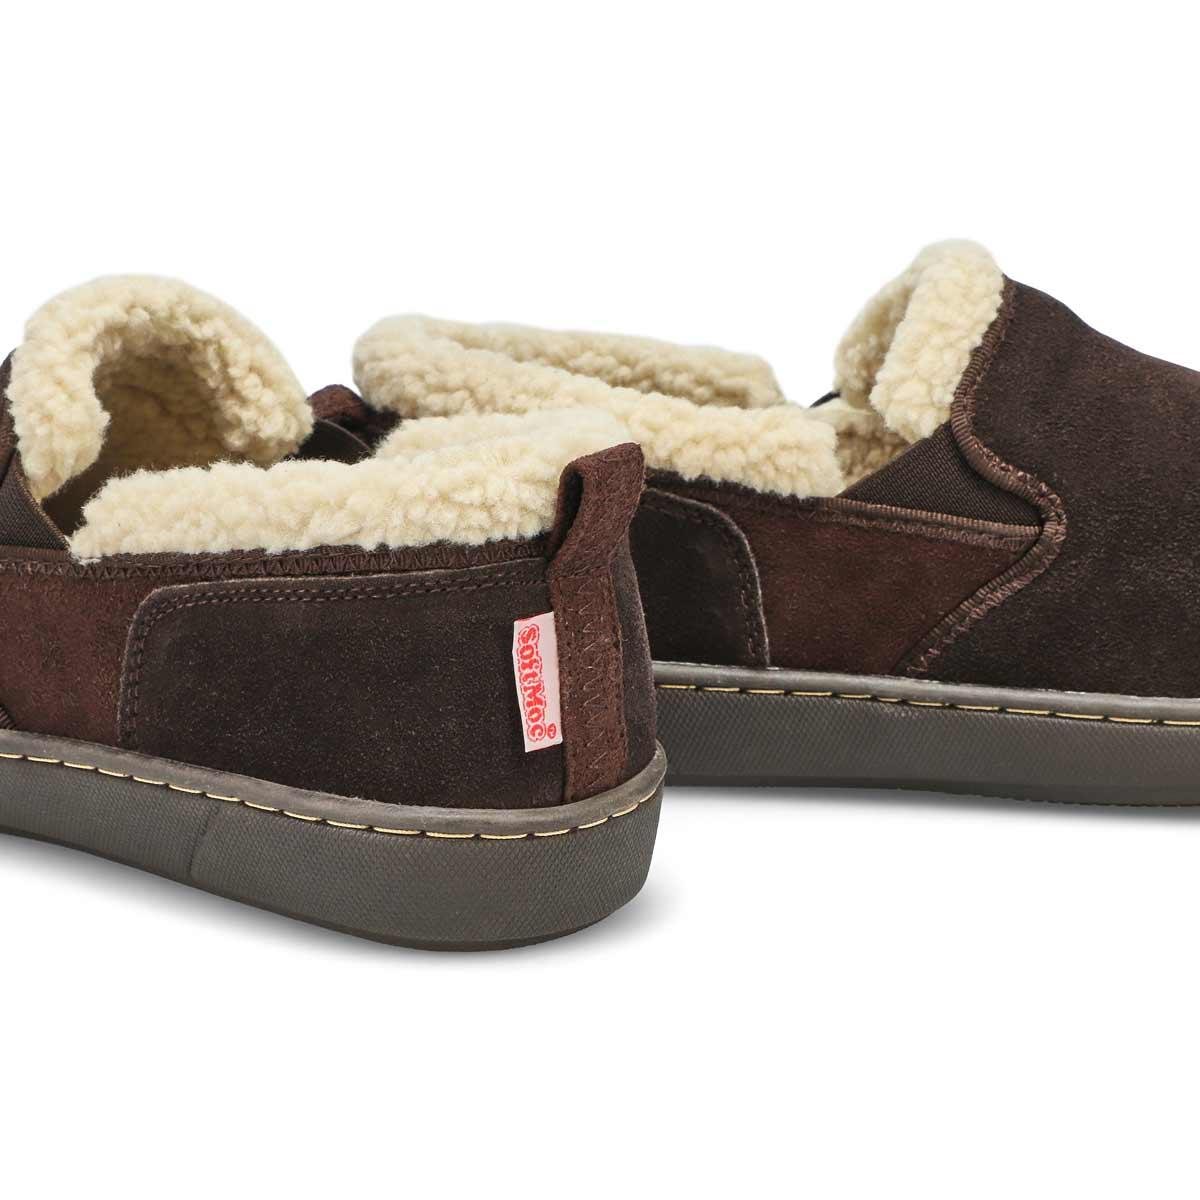 Mns Repete rootbeer memory foam slipper